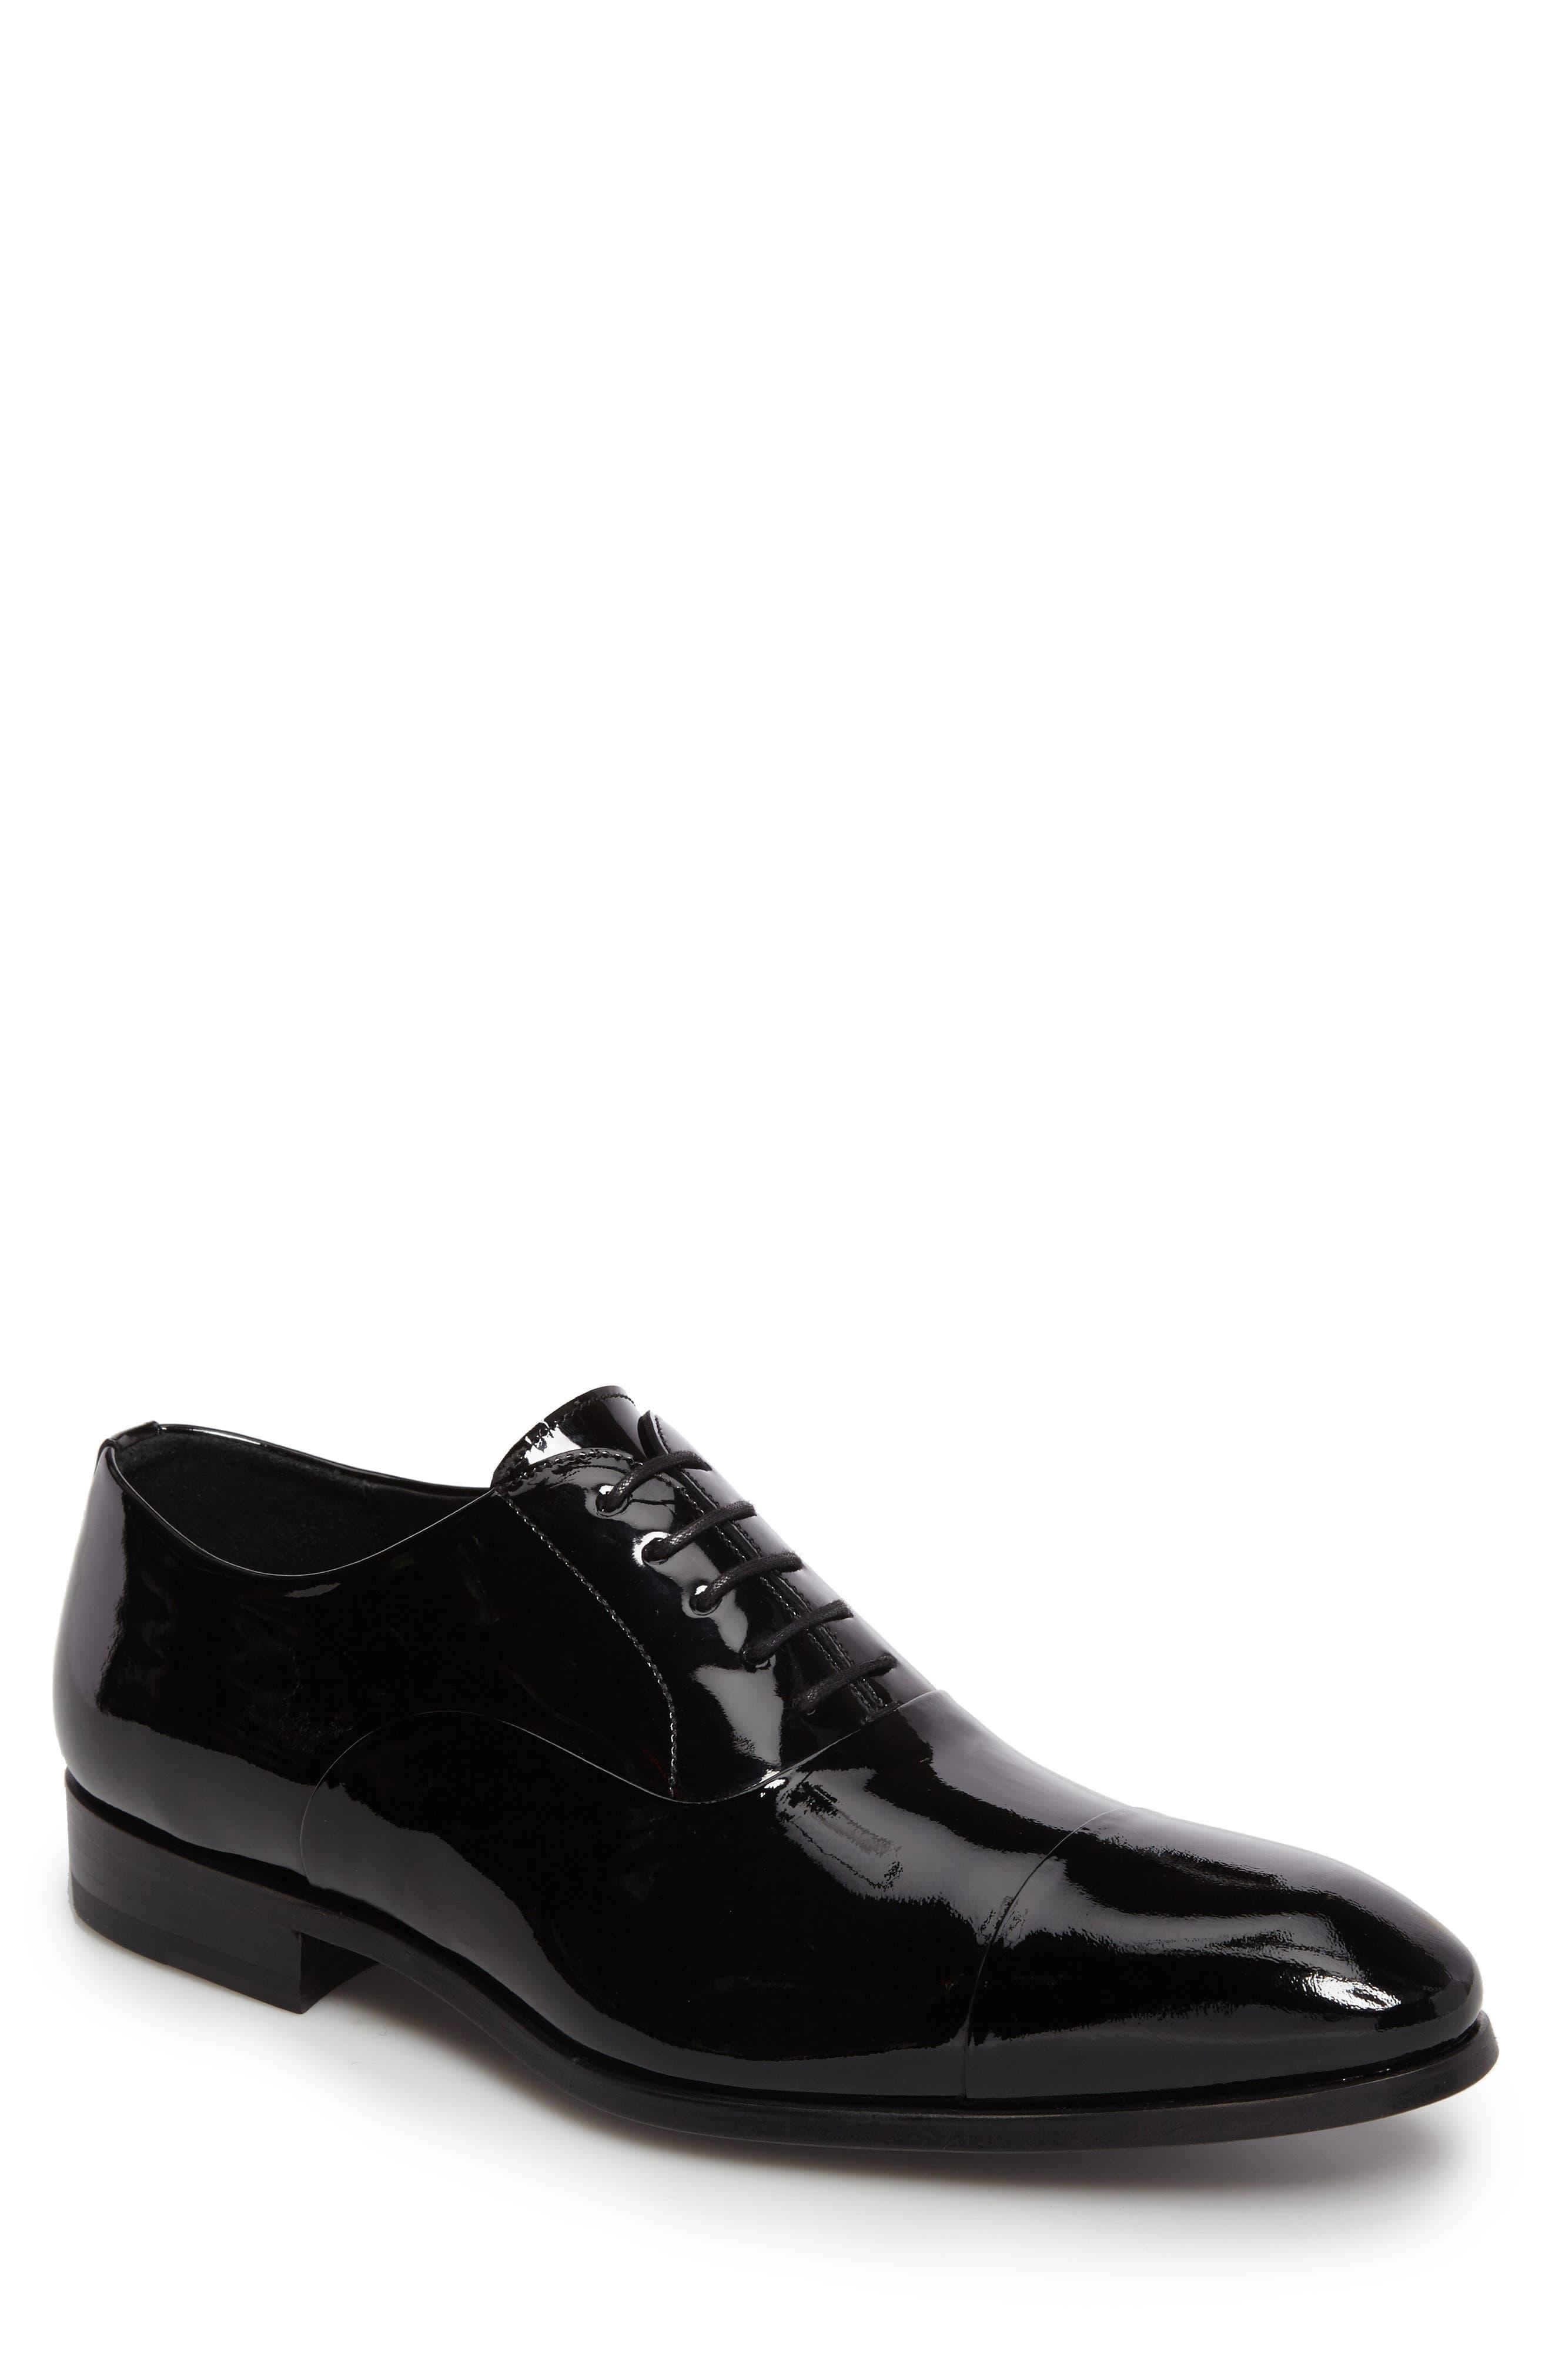 Davian Cap Toe Oxford,                             Main thumbnail 1, color,                             Black Patent